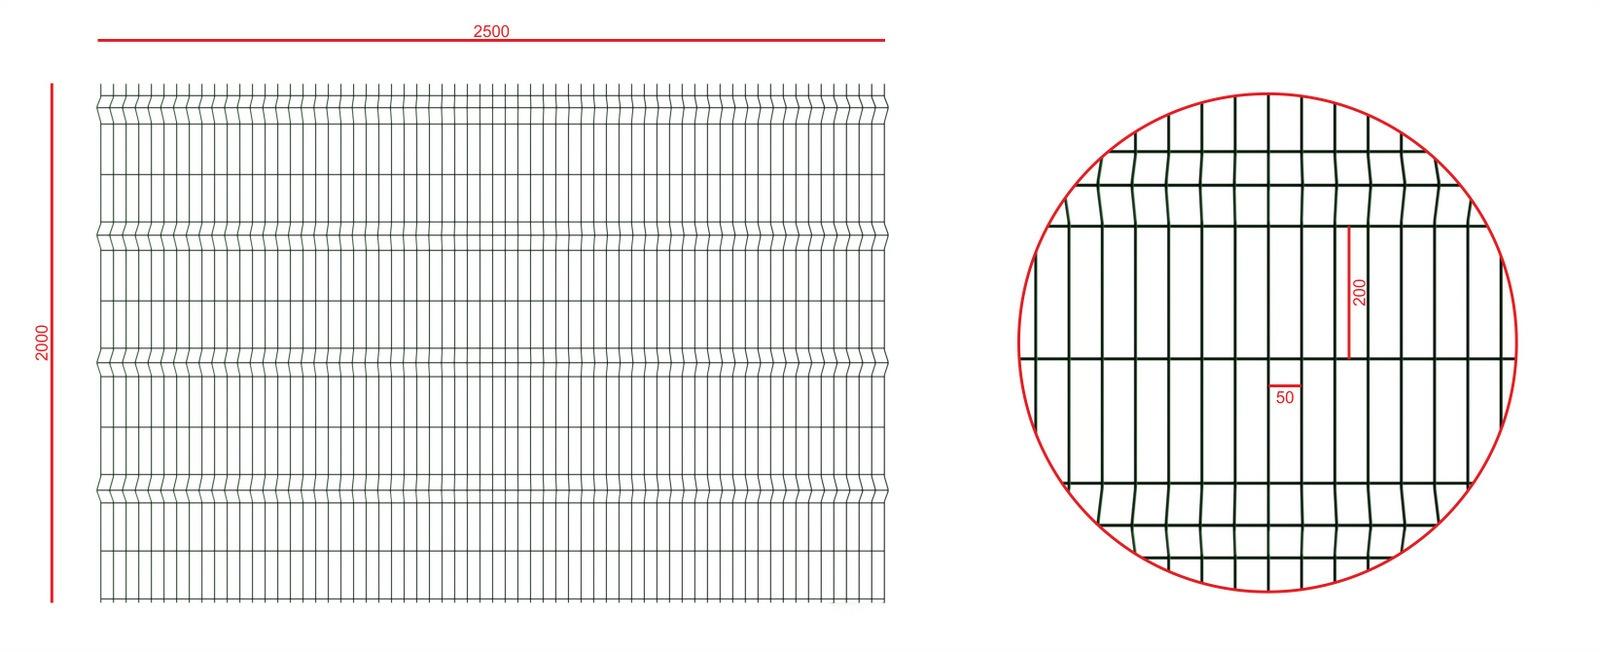 panel-3d-prosto-1-got